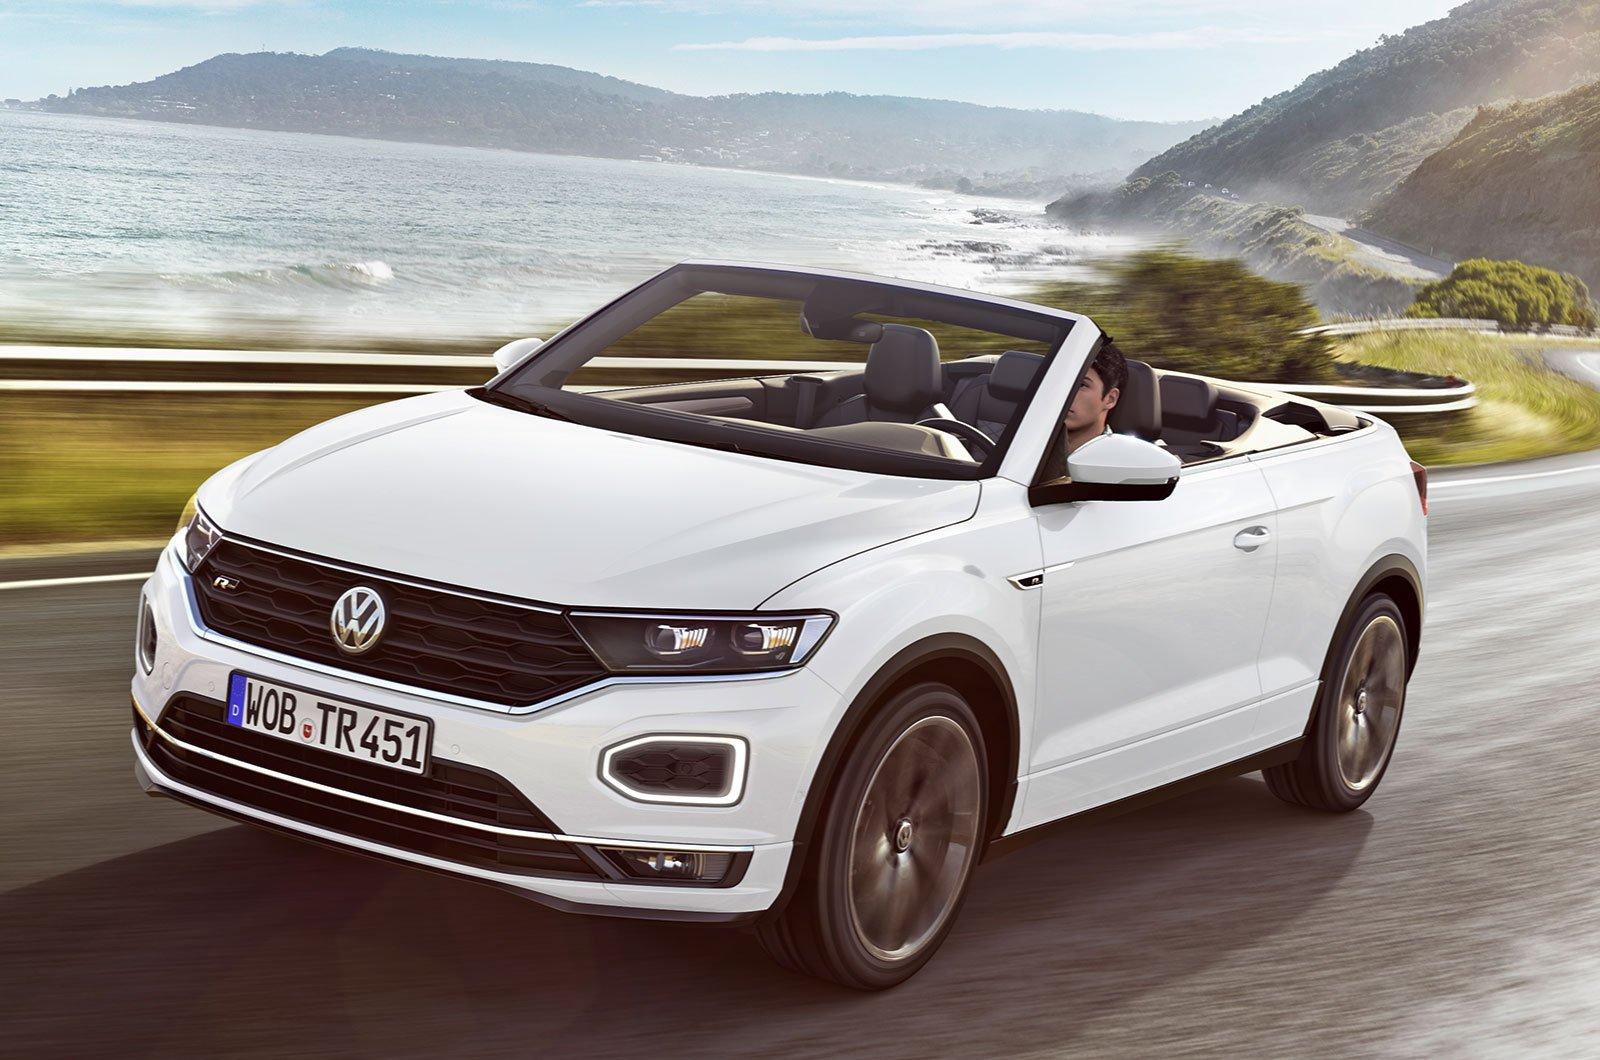 Volkswagen T-Roc Cabriolet front